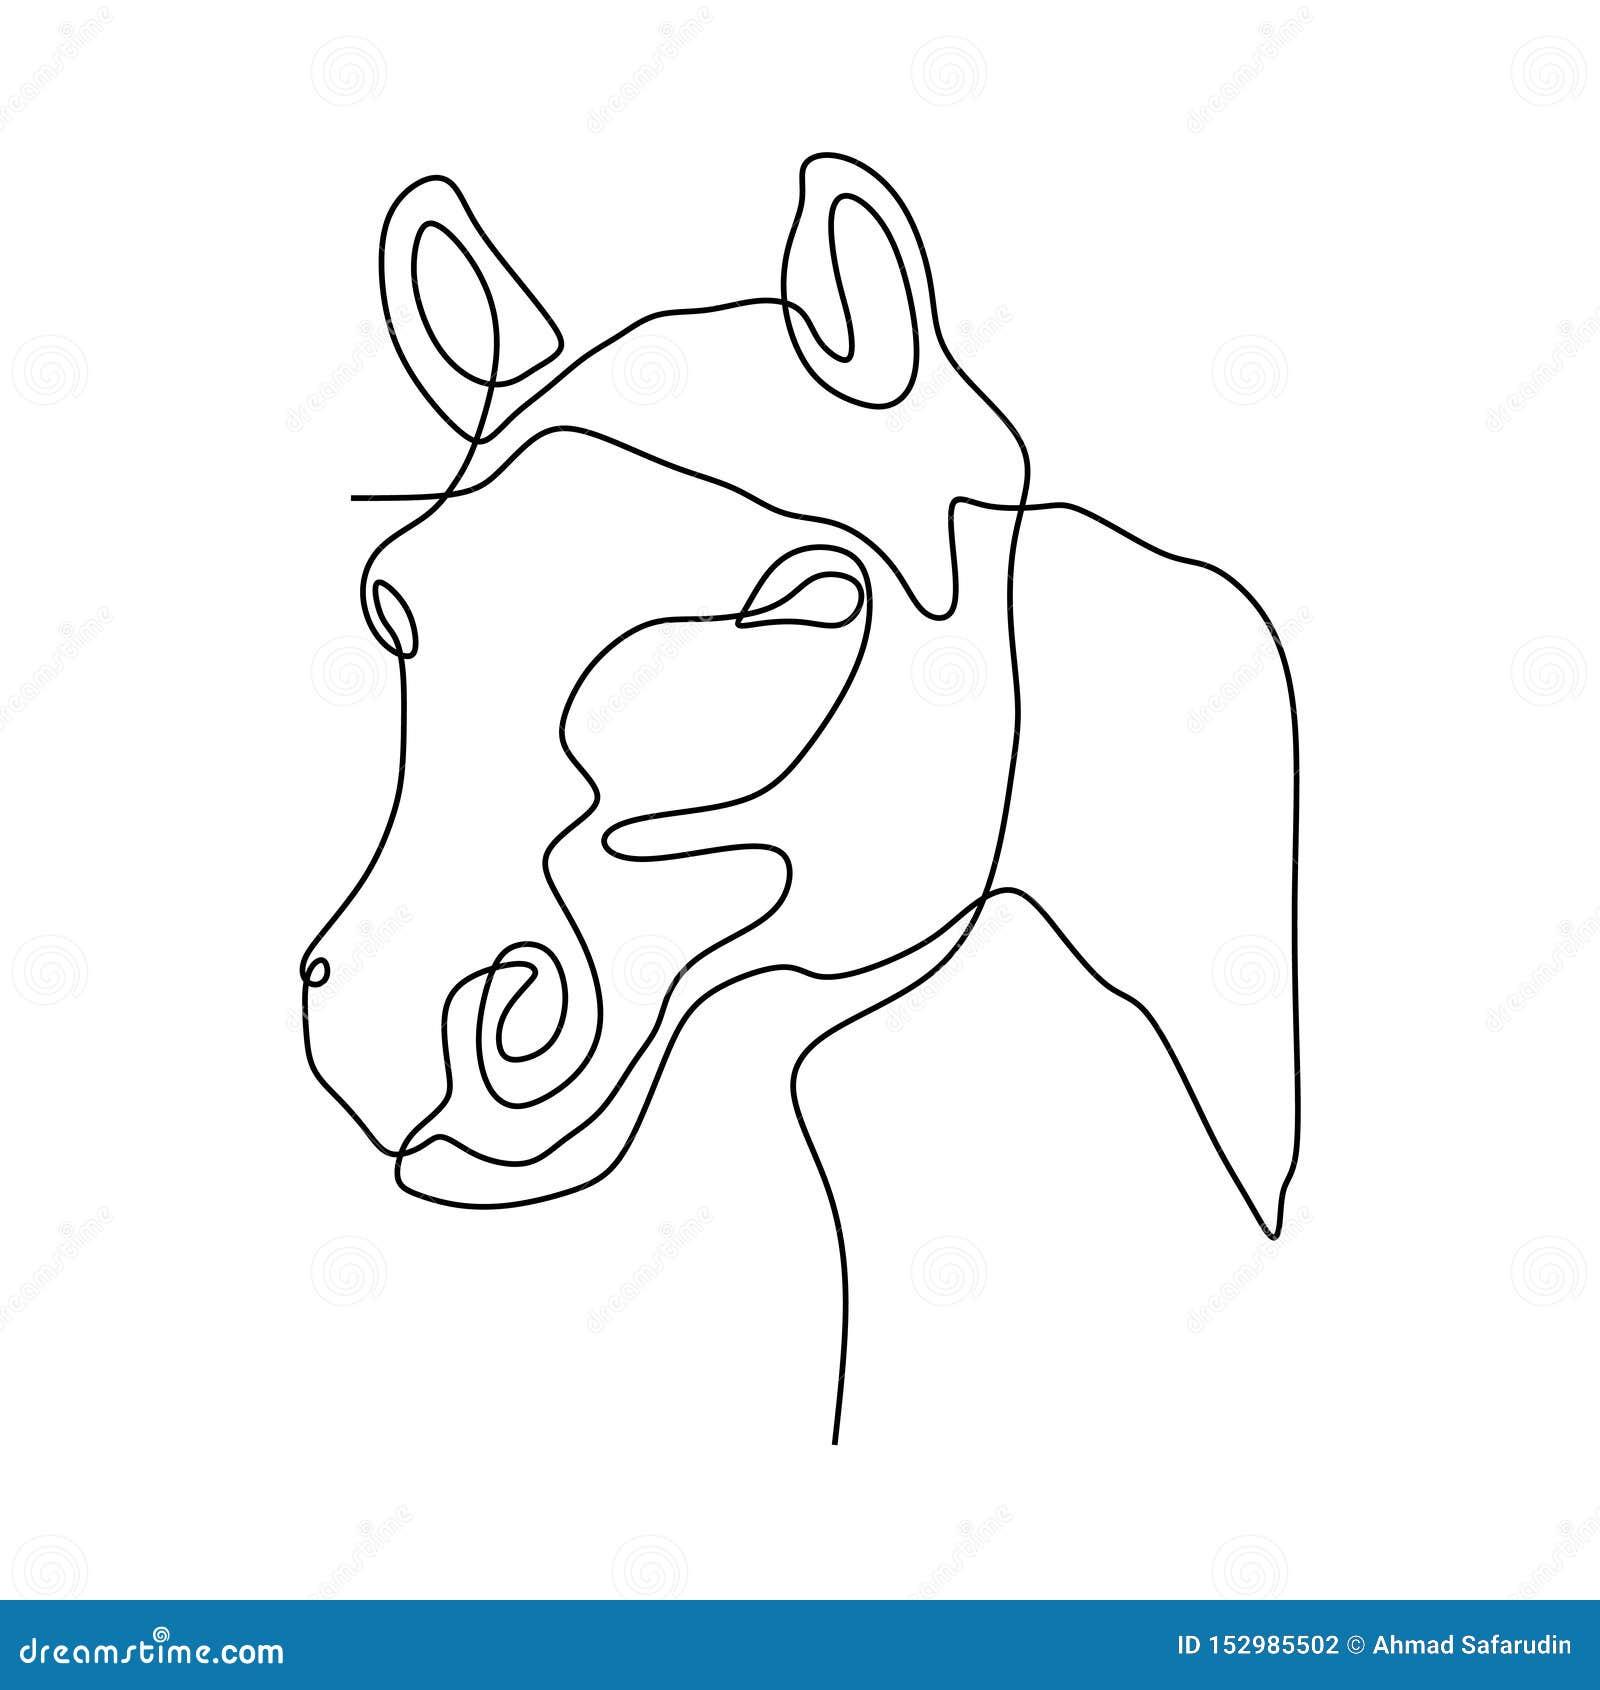 Continuous One Line Horse Head Minimalist Design Vector Illustration Minimalism Style Stock Vector Illustration Of Vector Drawn 152985502